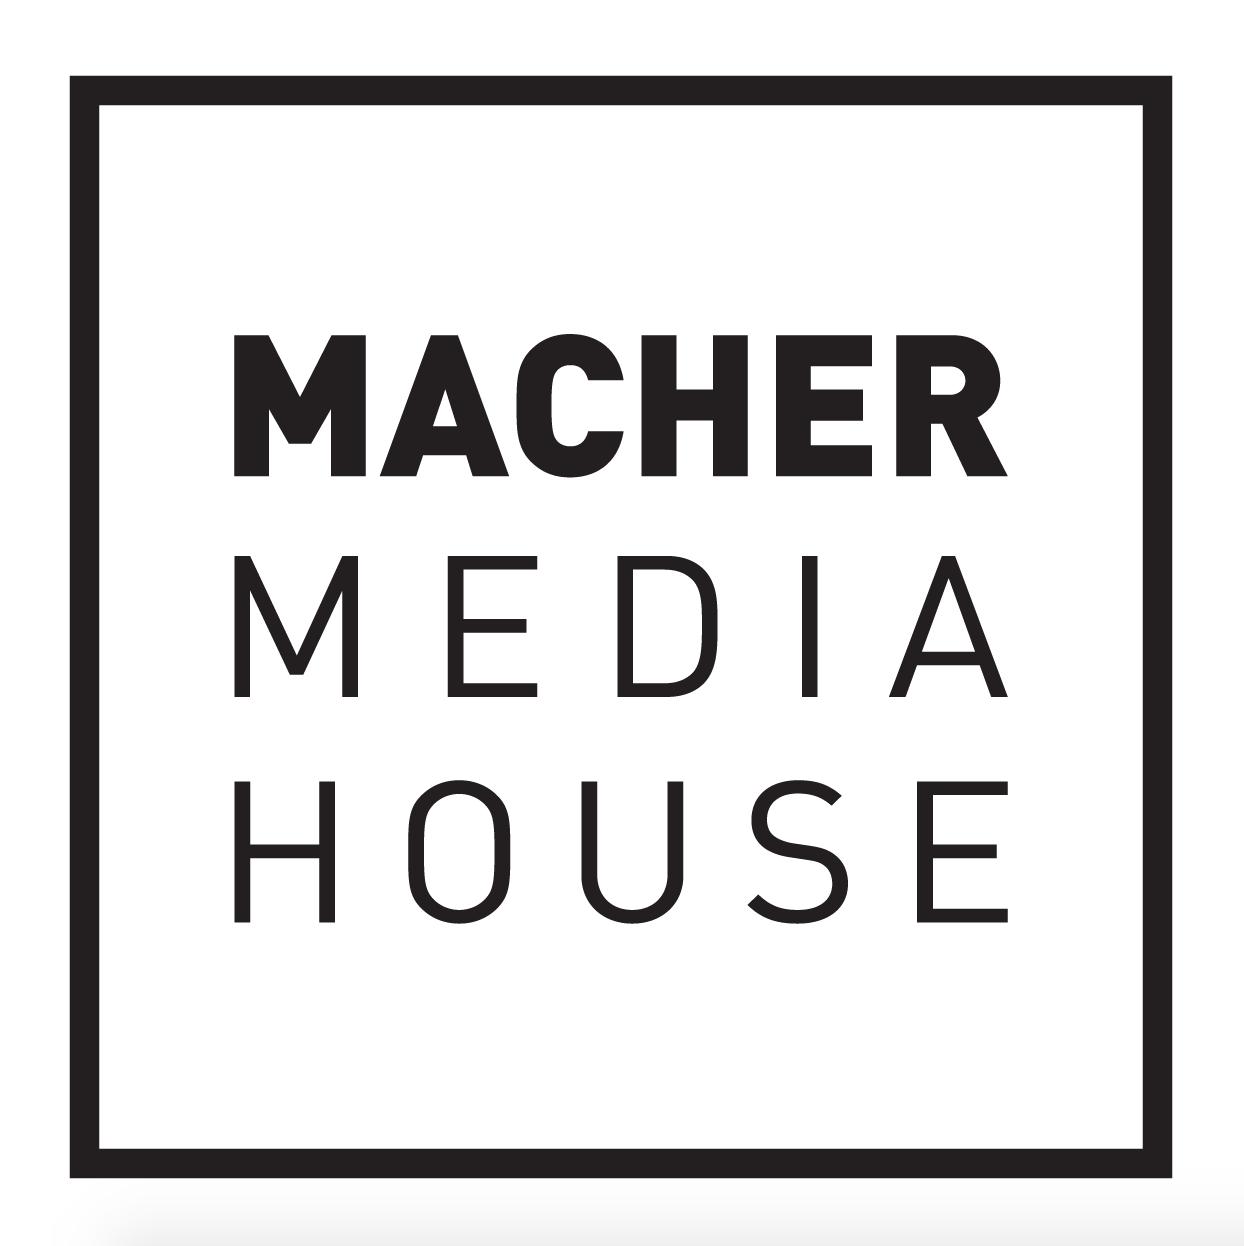 MACHER MEDIA HOUSE